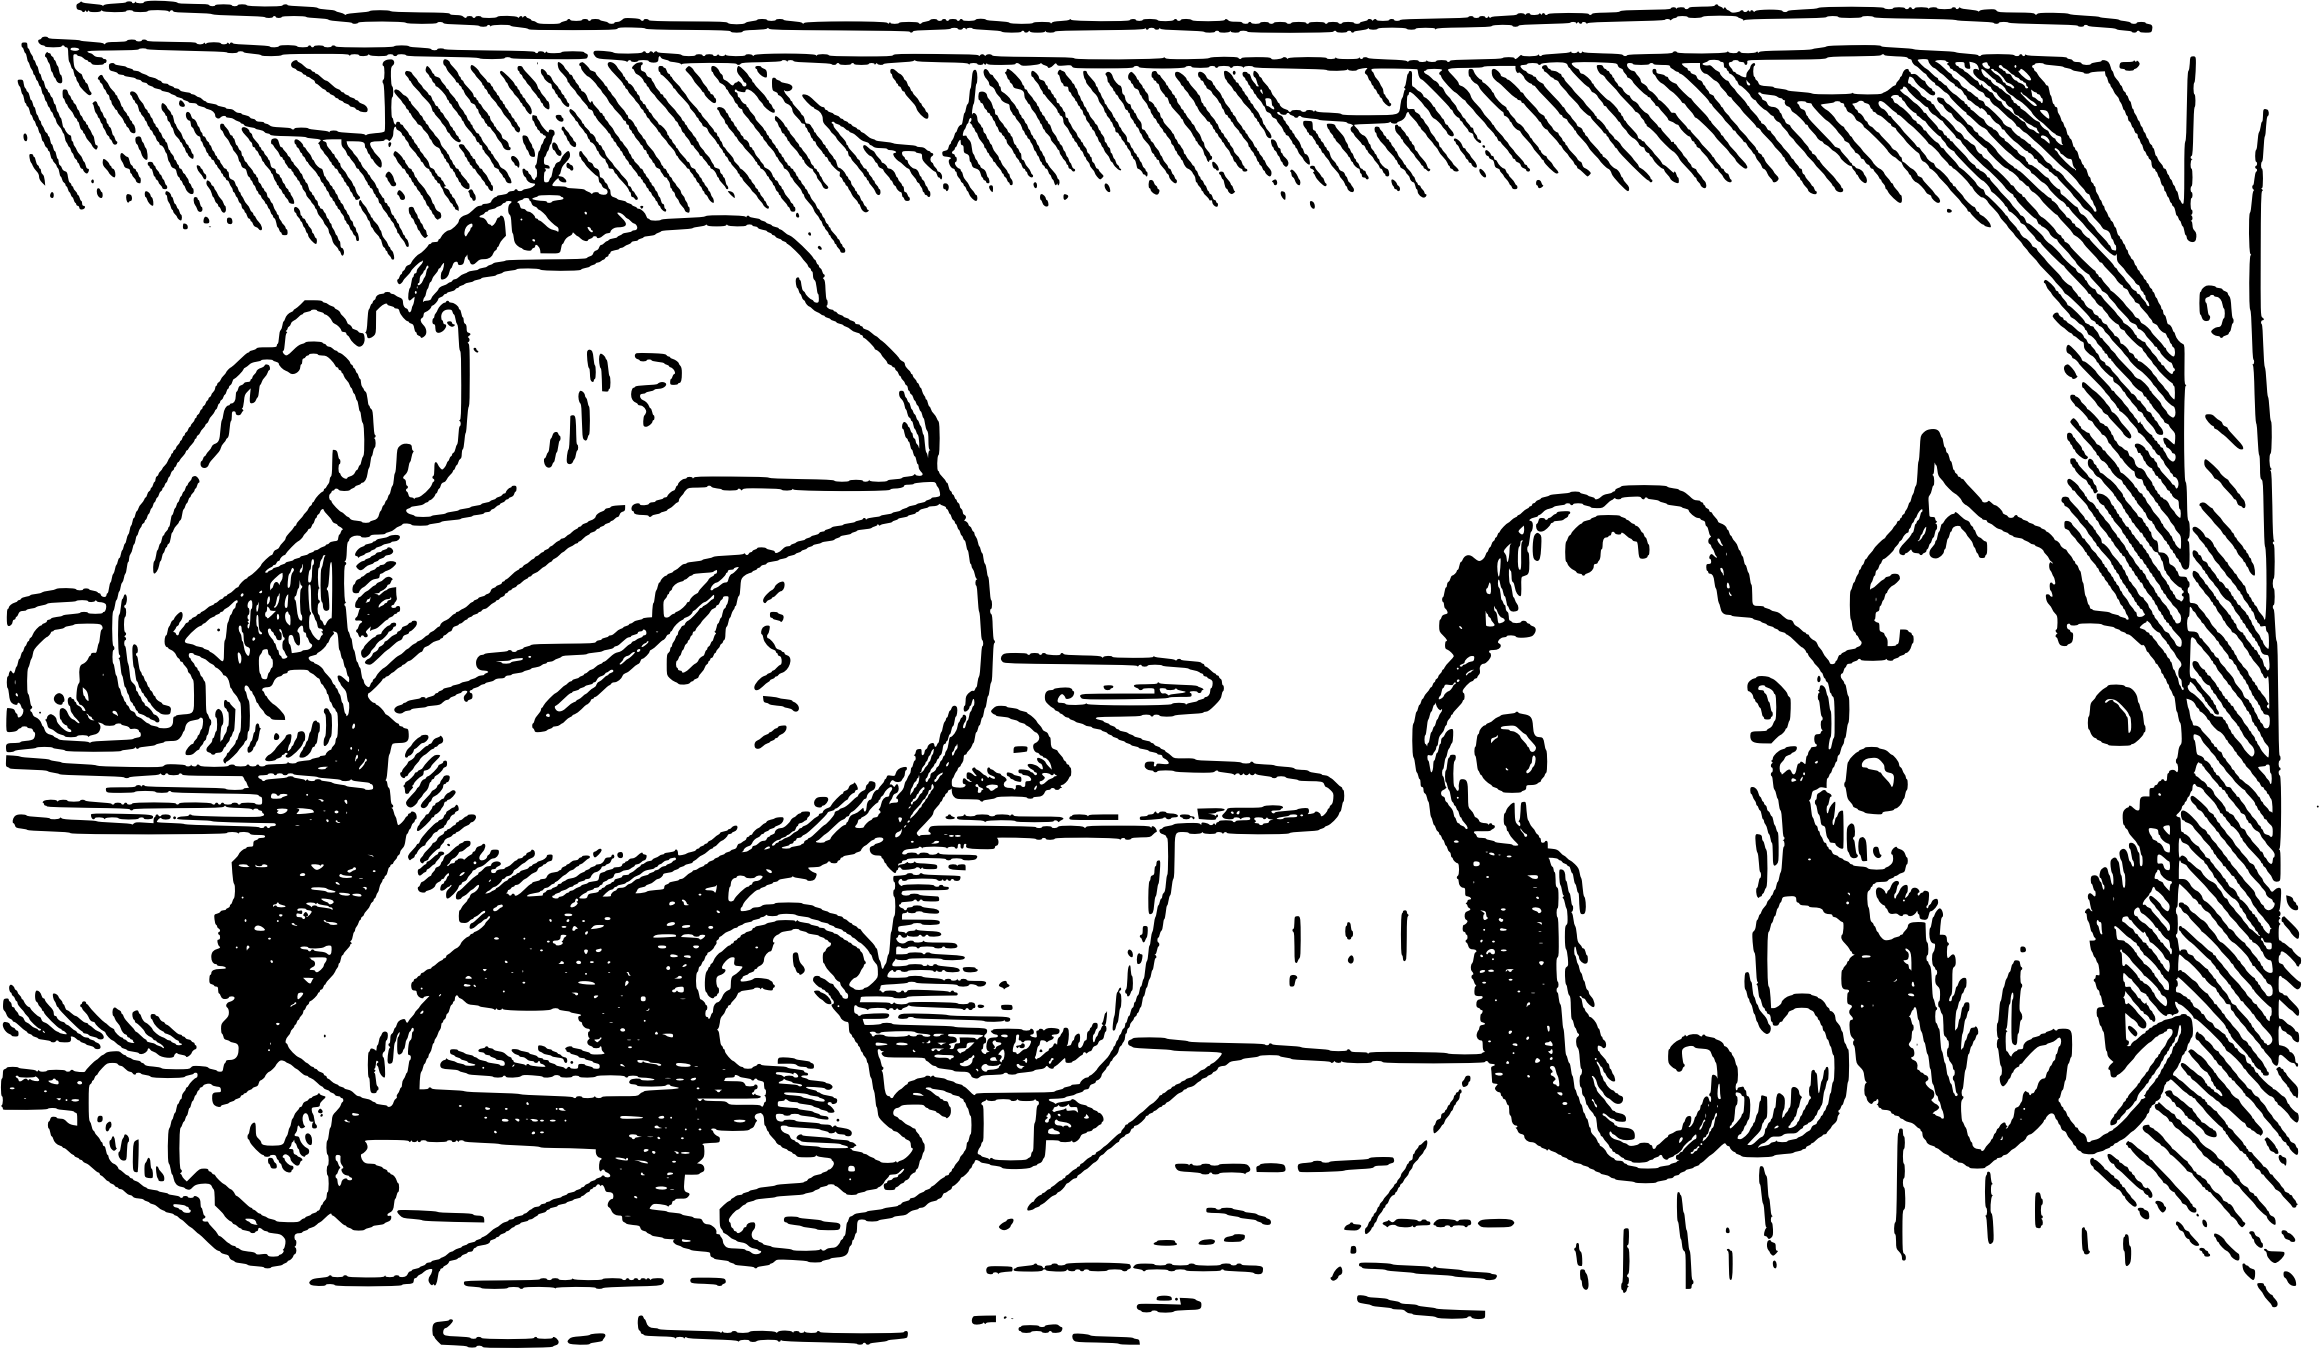 Clipart max und moritz black and white Clipart - Max und Moritz - Busch 078 black and white